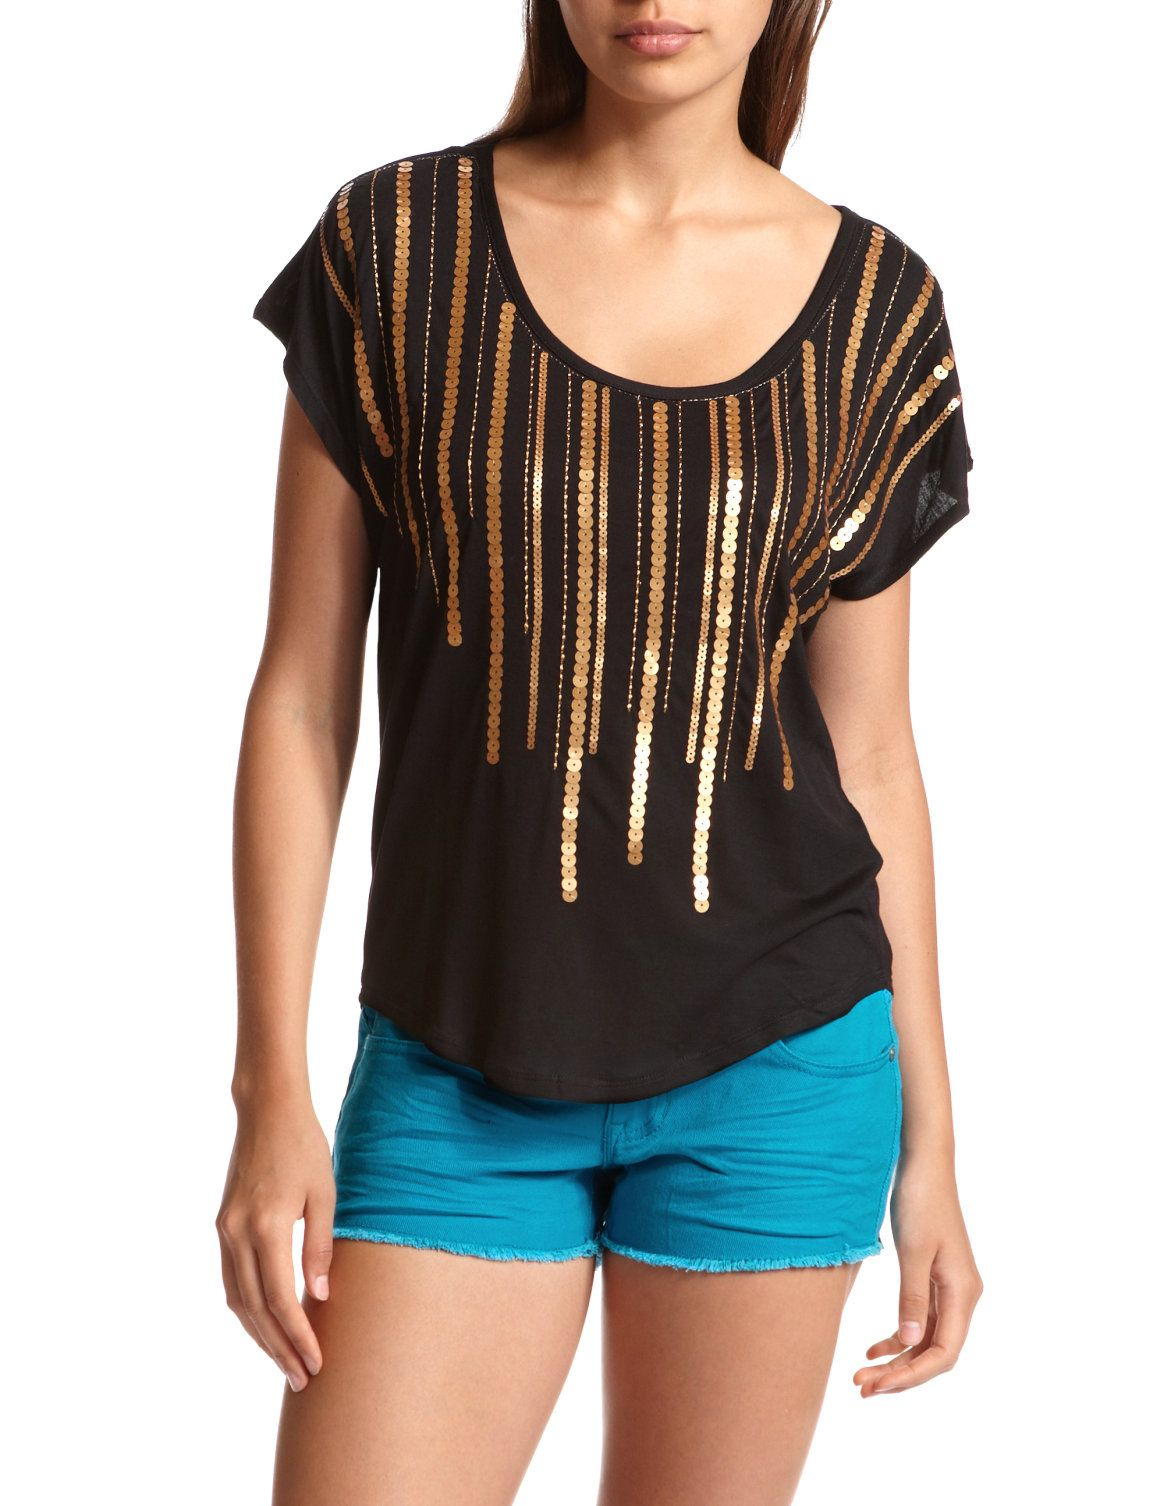 Horizontal Sequin Knit Top